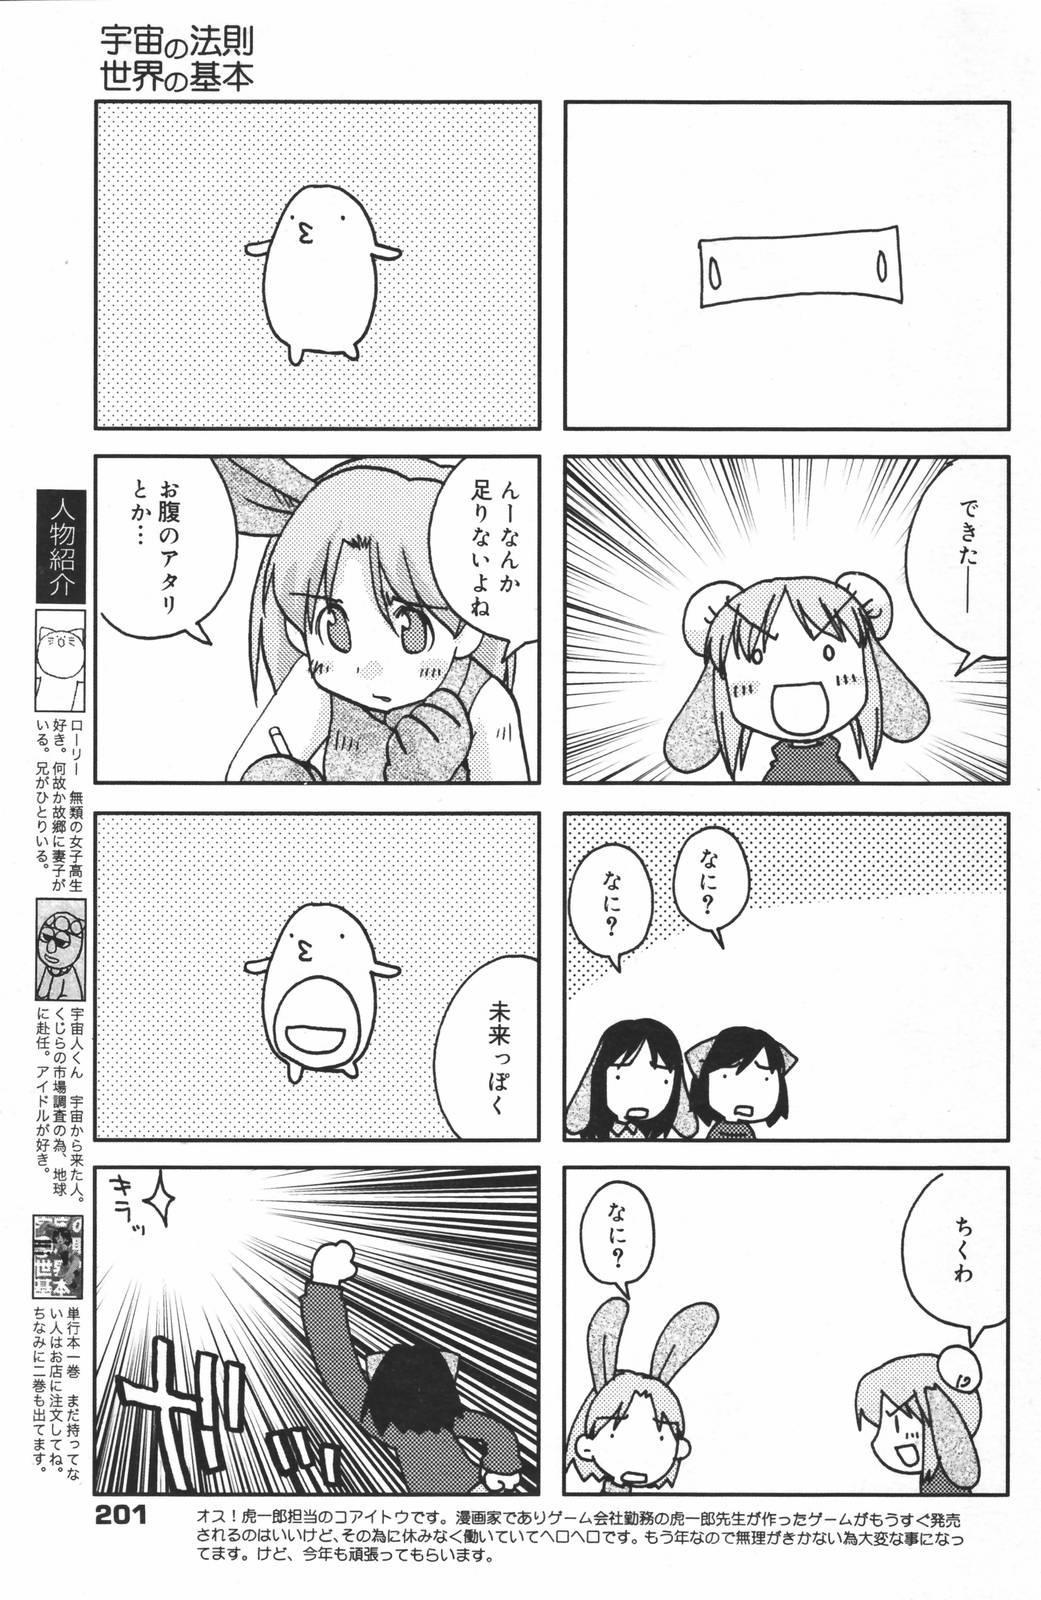 Manga Bangaichi 2007-03 200